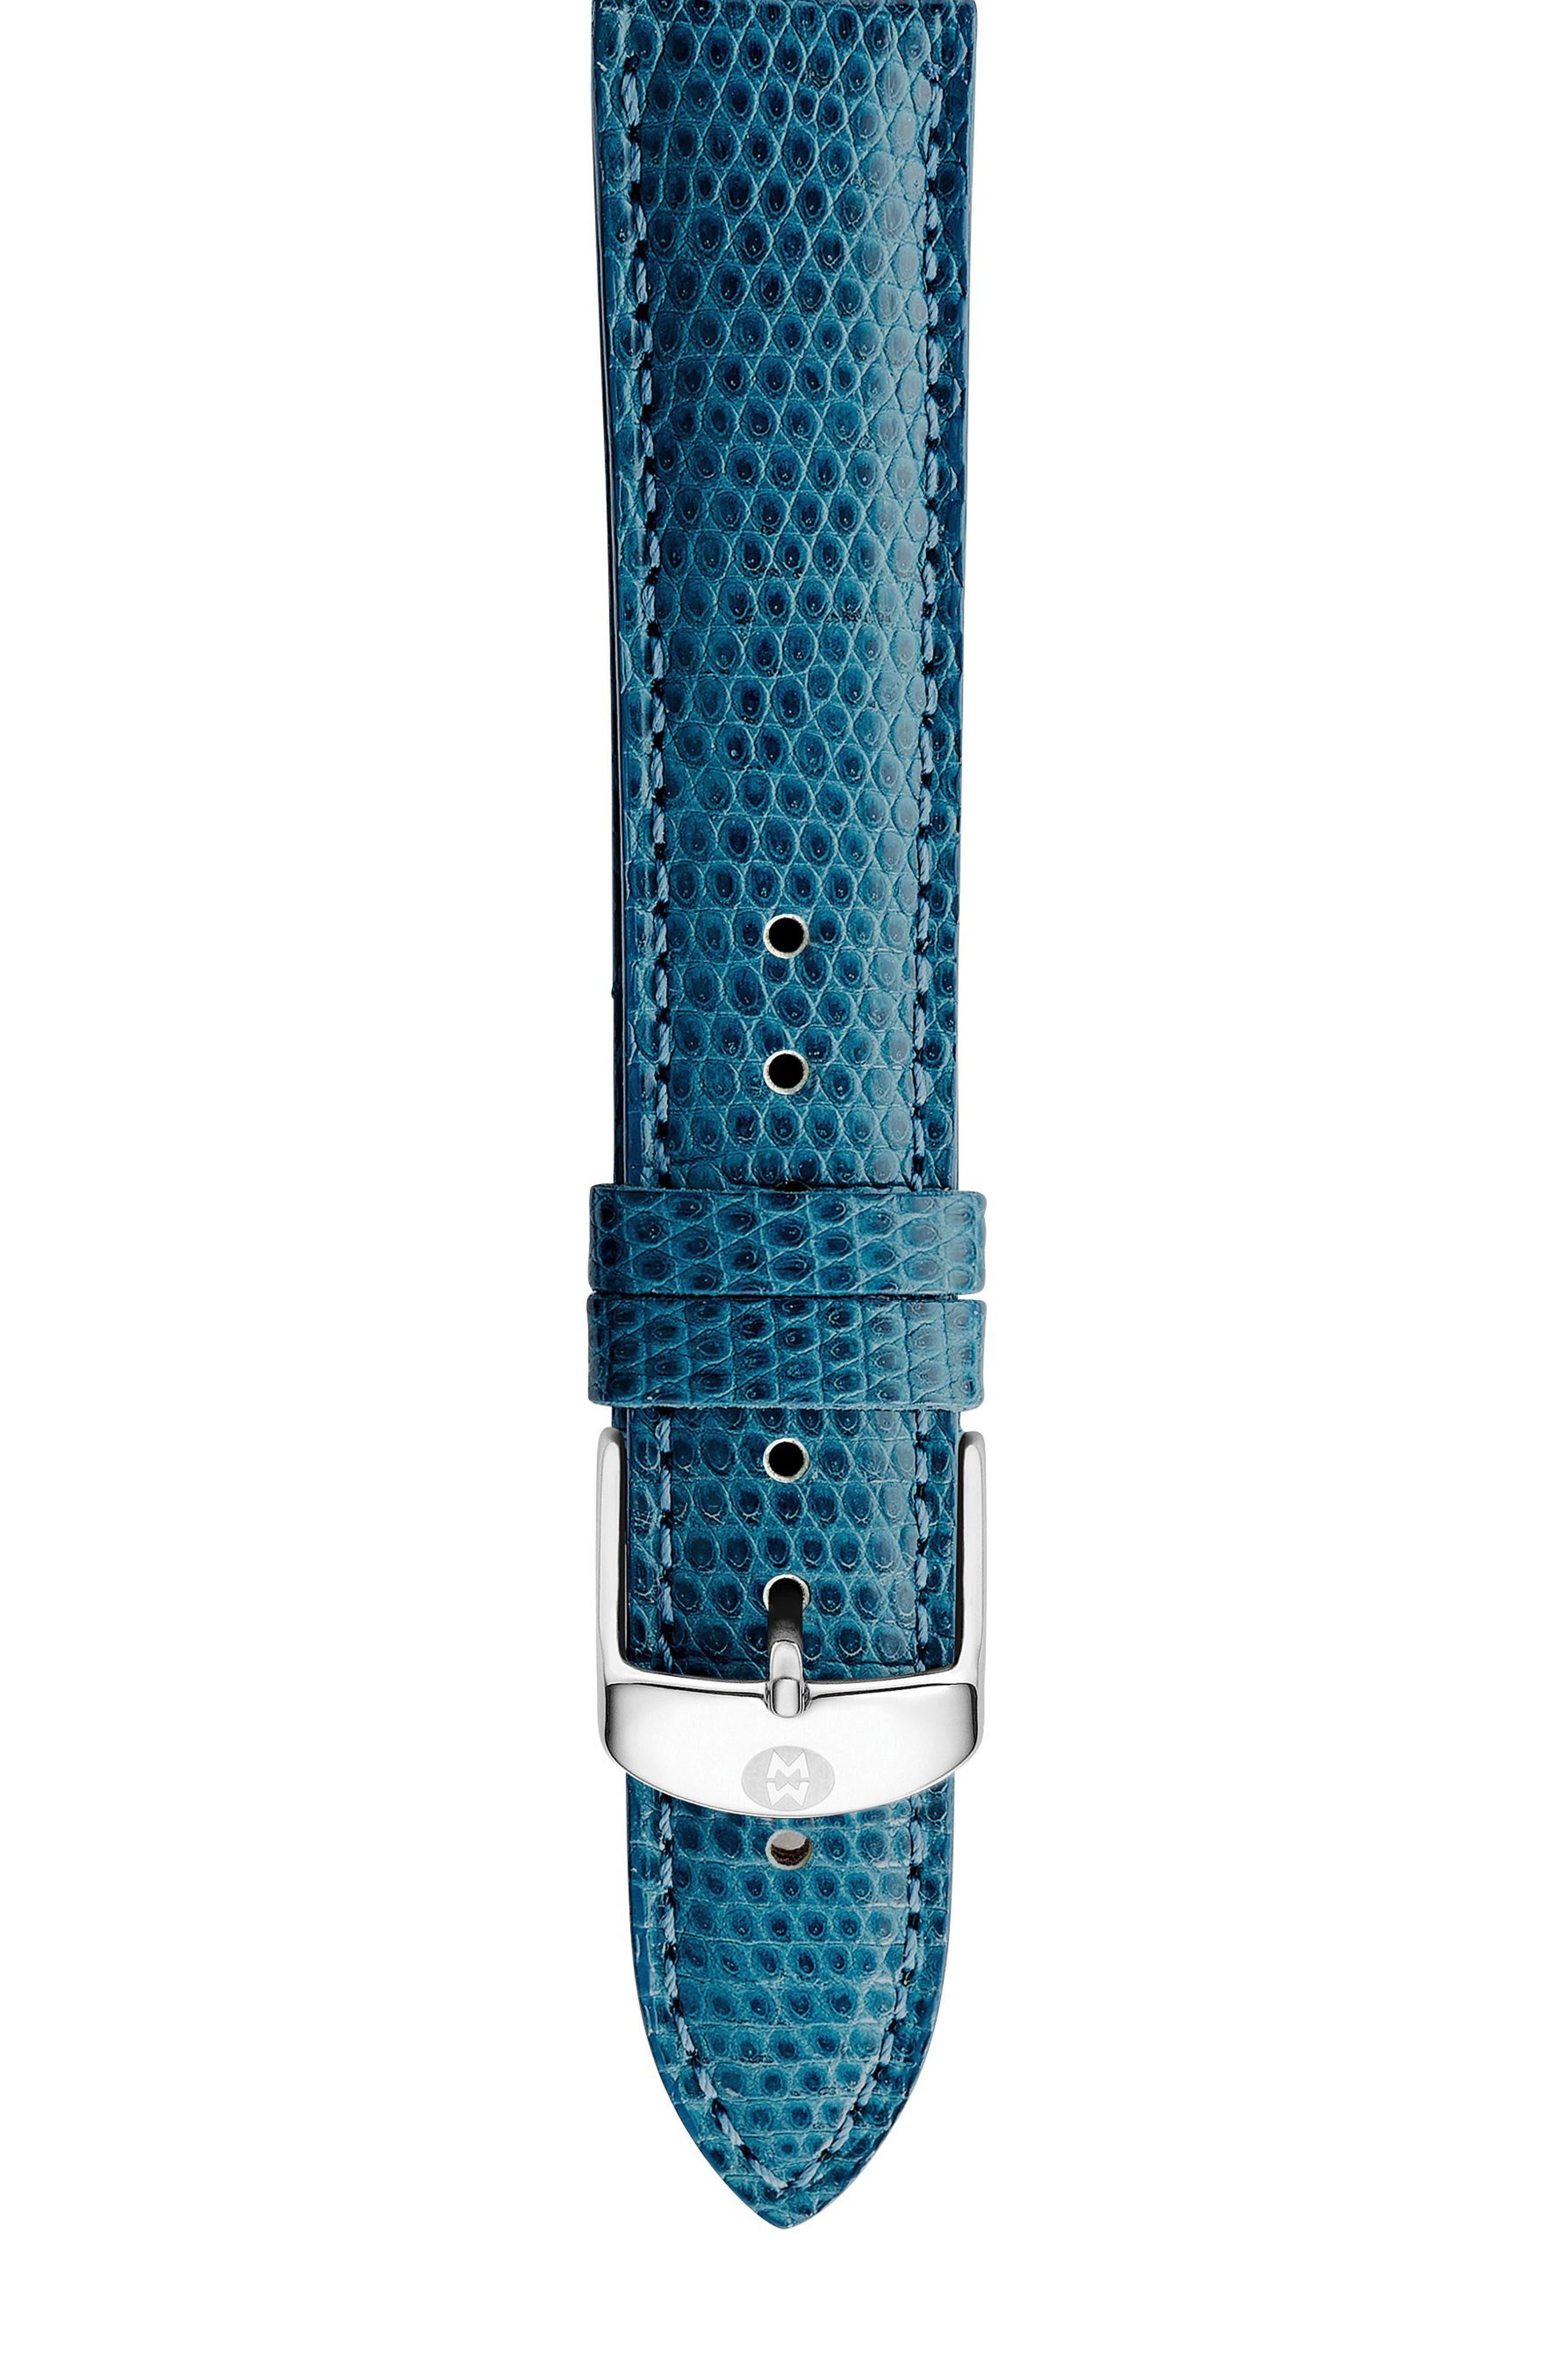 Alternate Image 1 Selected - MICHELE 18mm Lizardskin Watch Strap